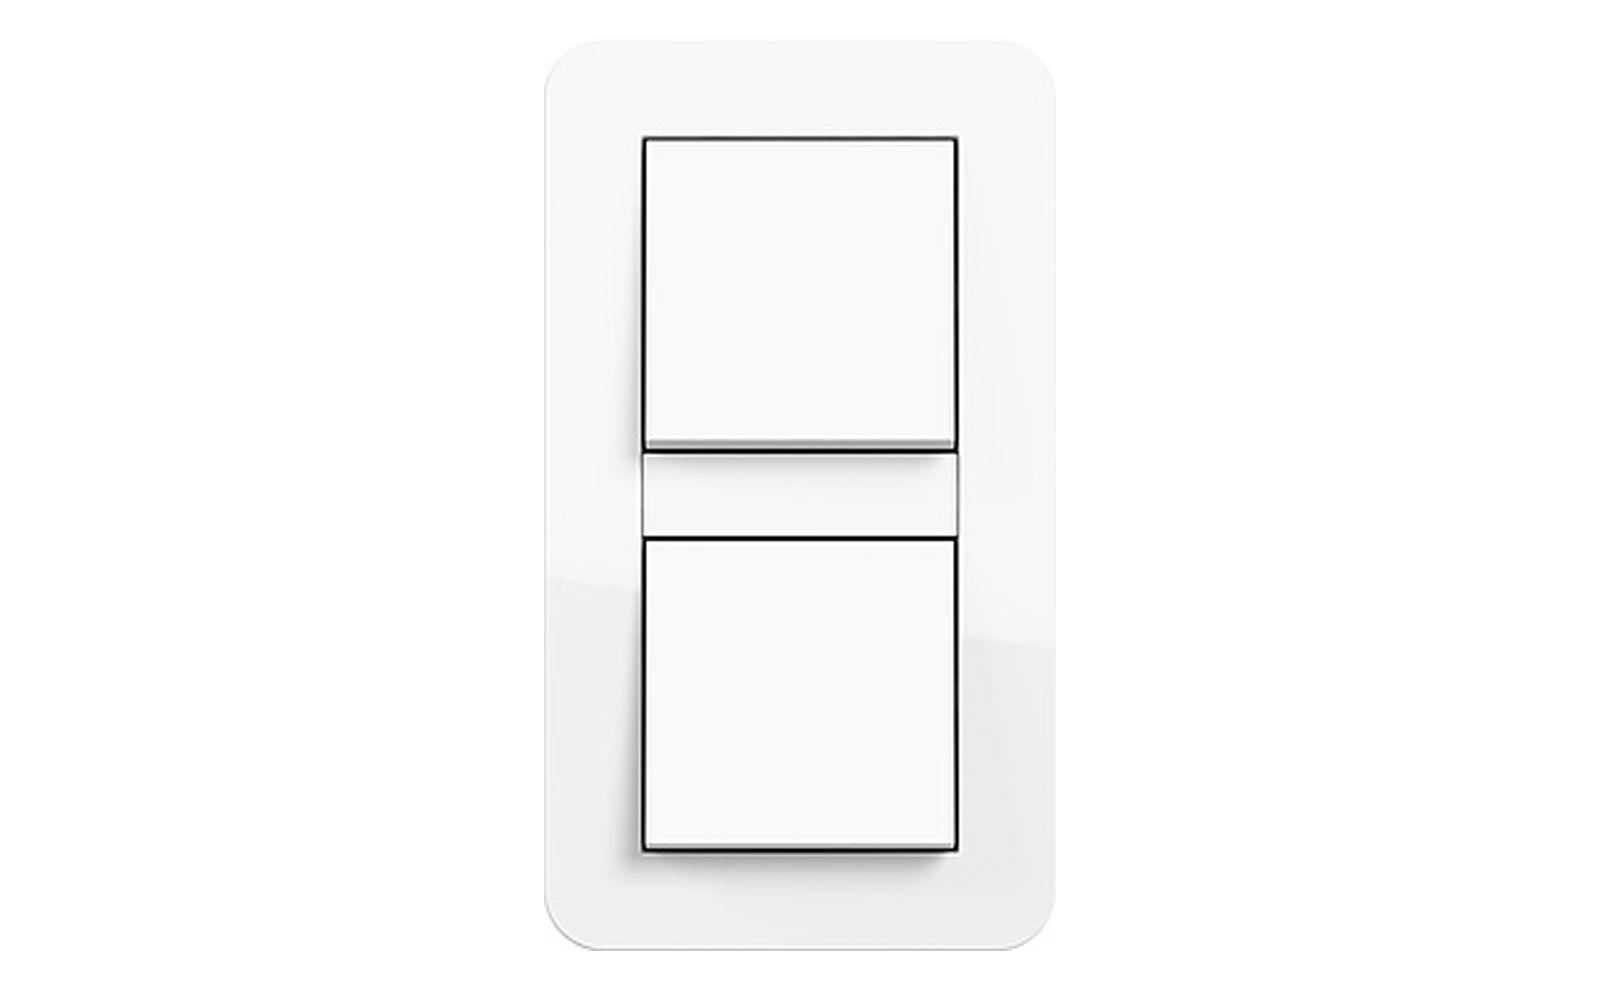 Wippschalter 2fach, Gira E3 Reinweiß glänzend